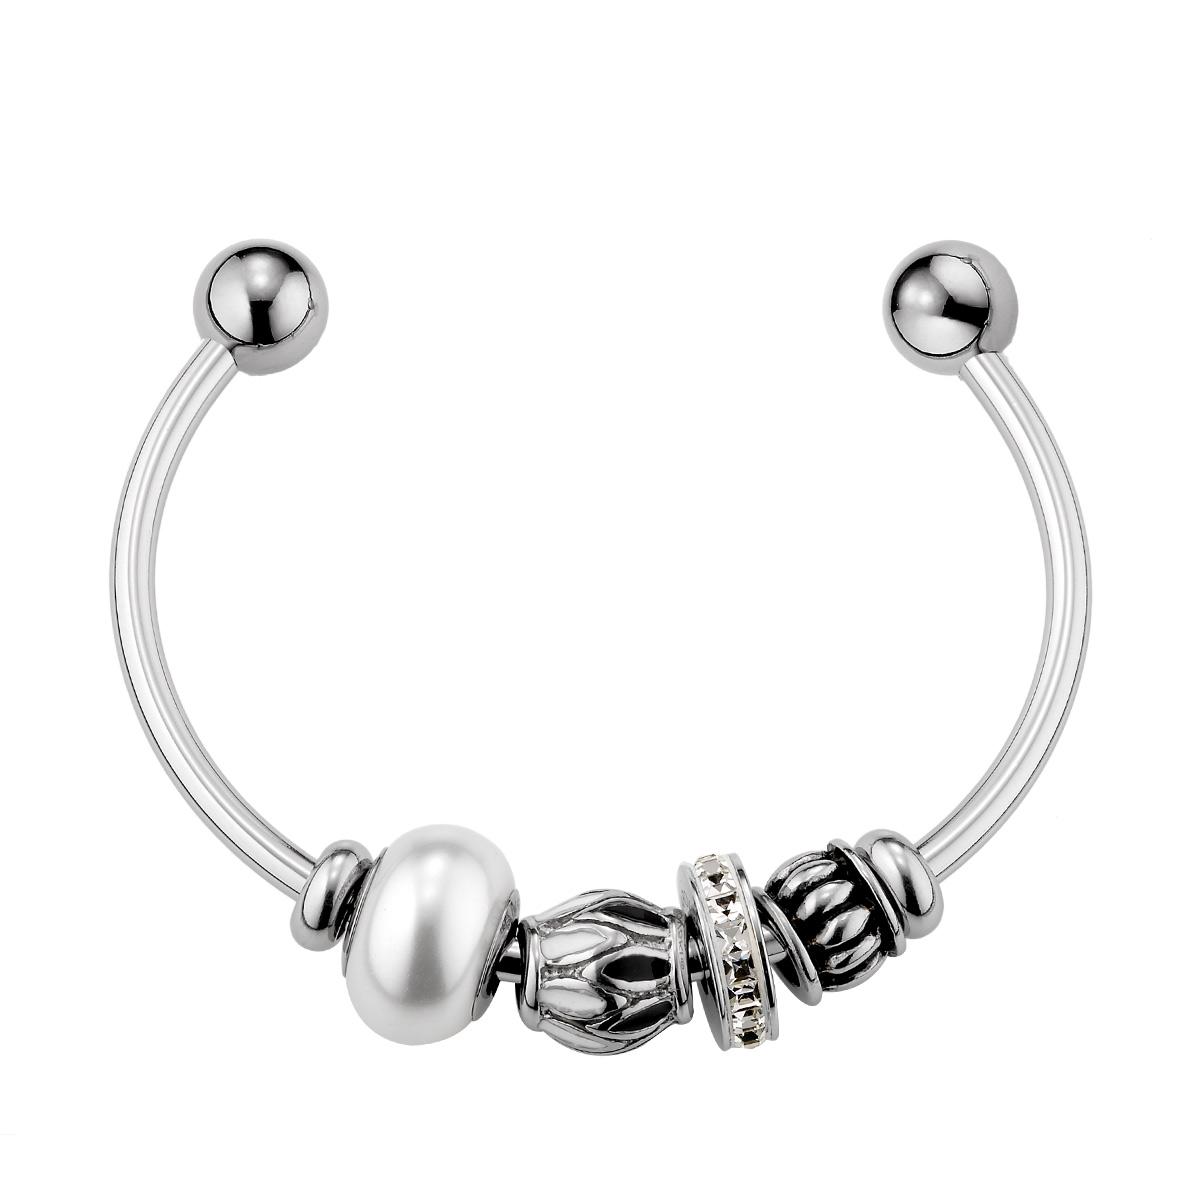 C151 圓形DIY串珠手環(不含珠飾)